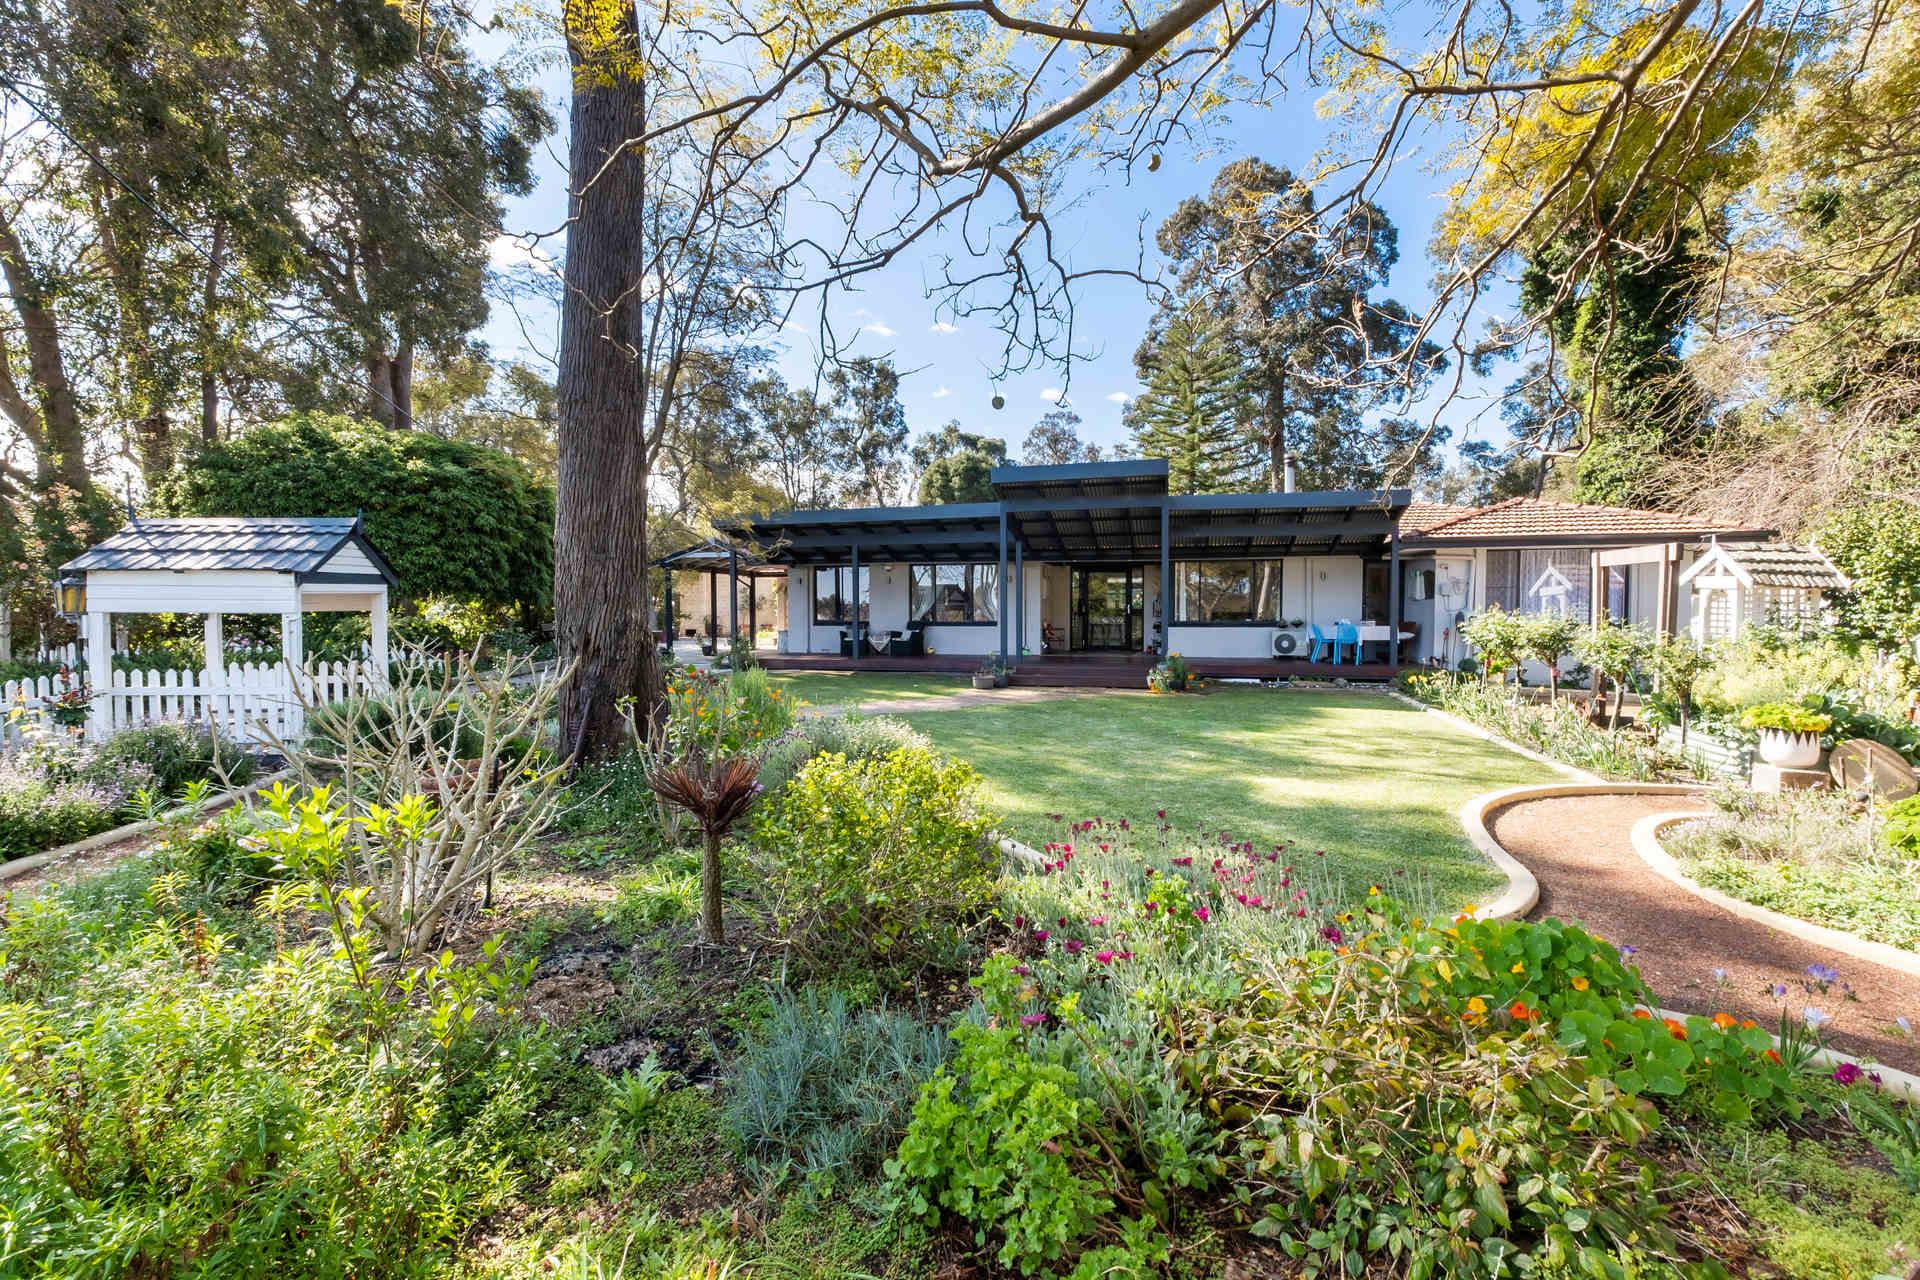 Property for sale in CARMEL